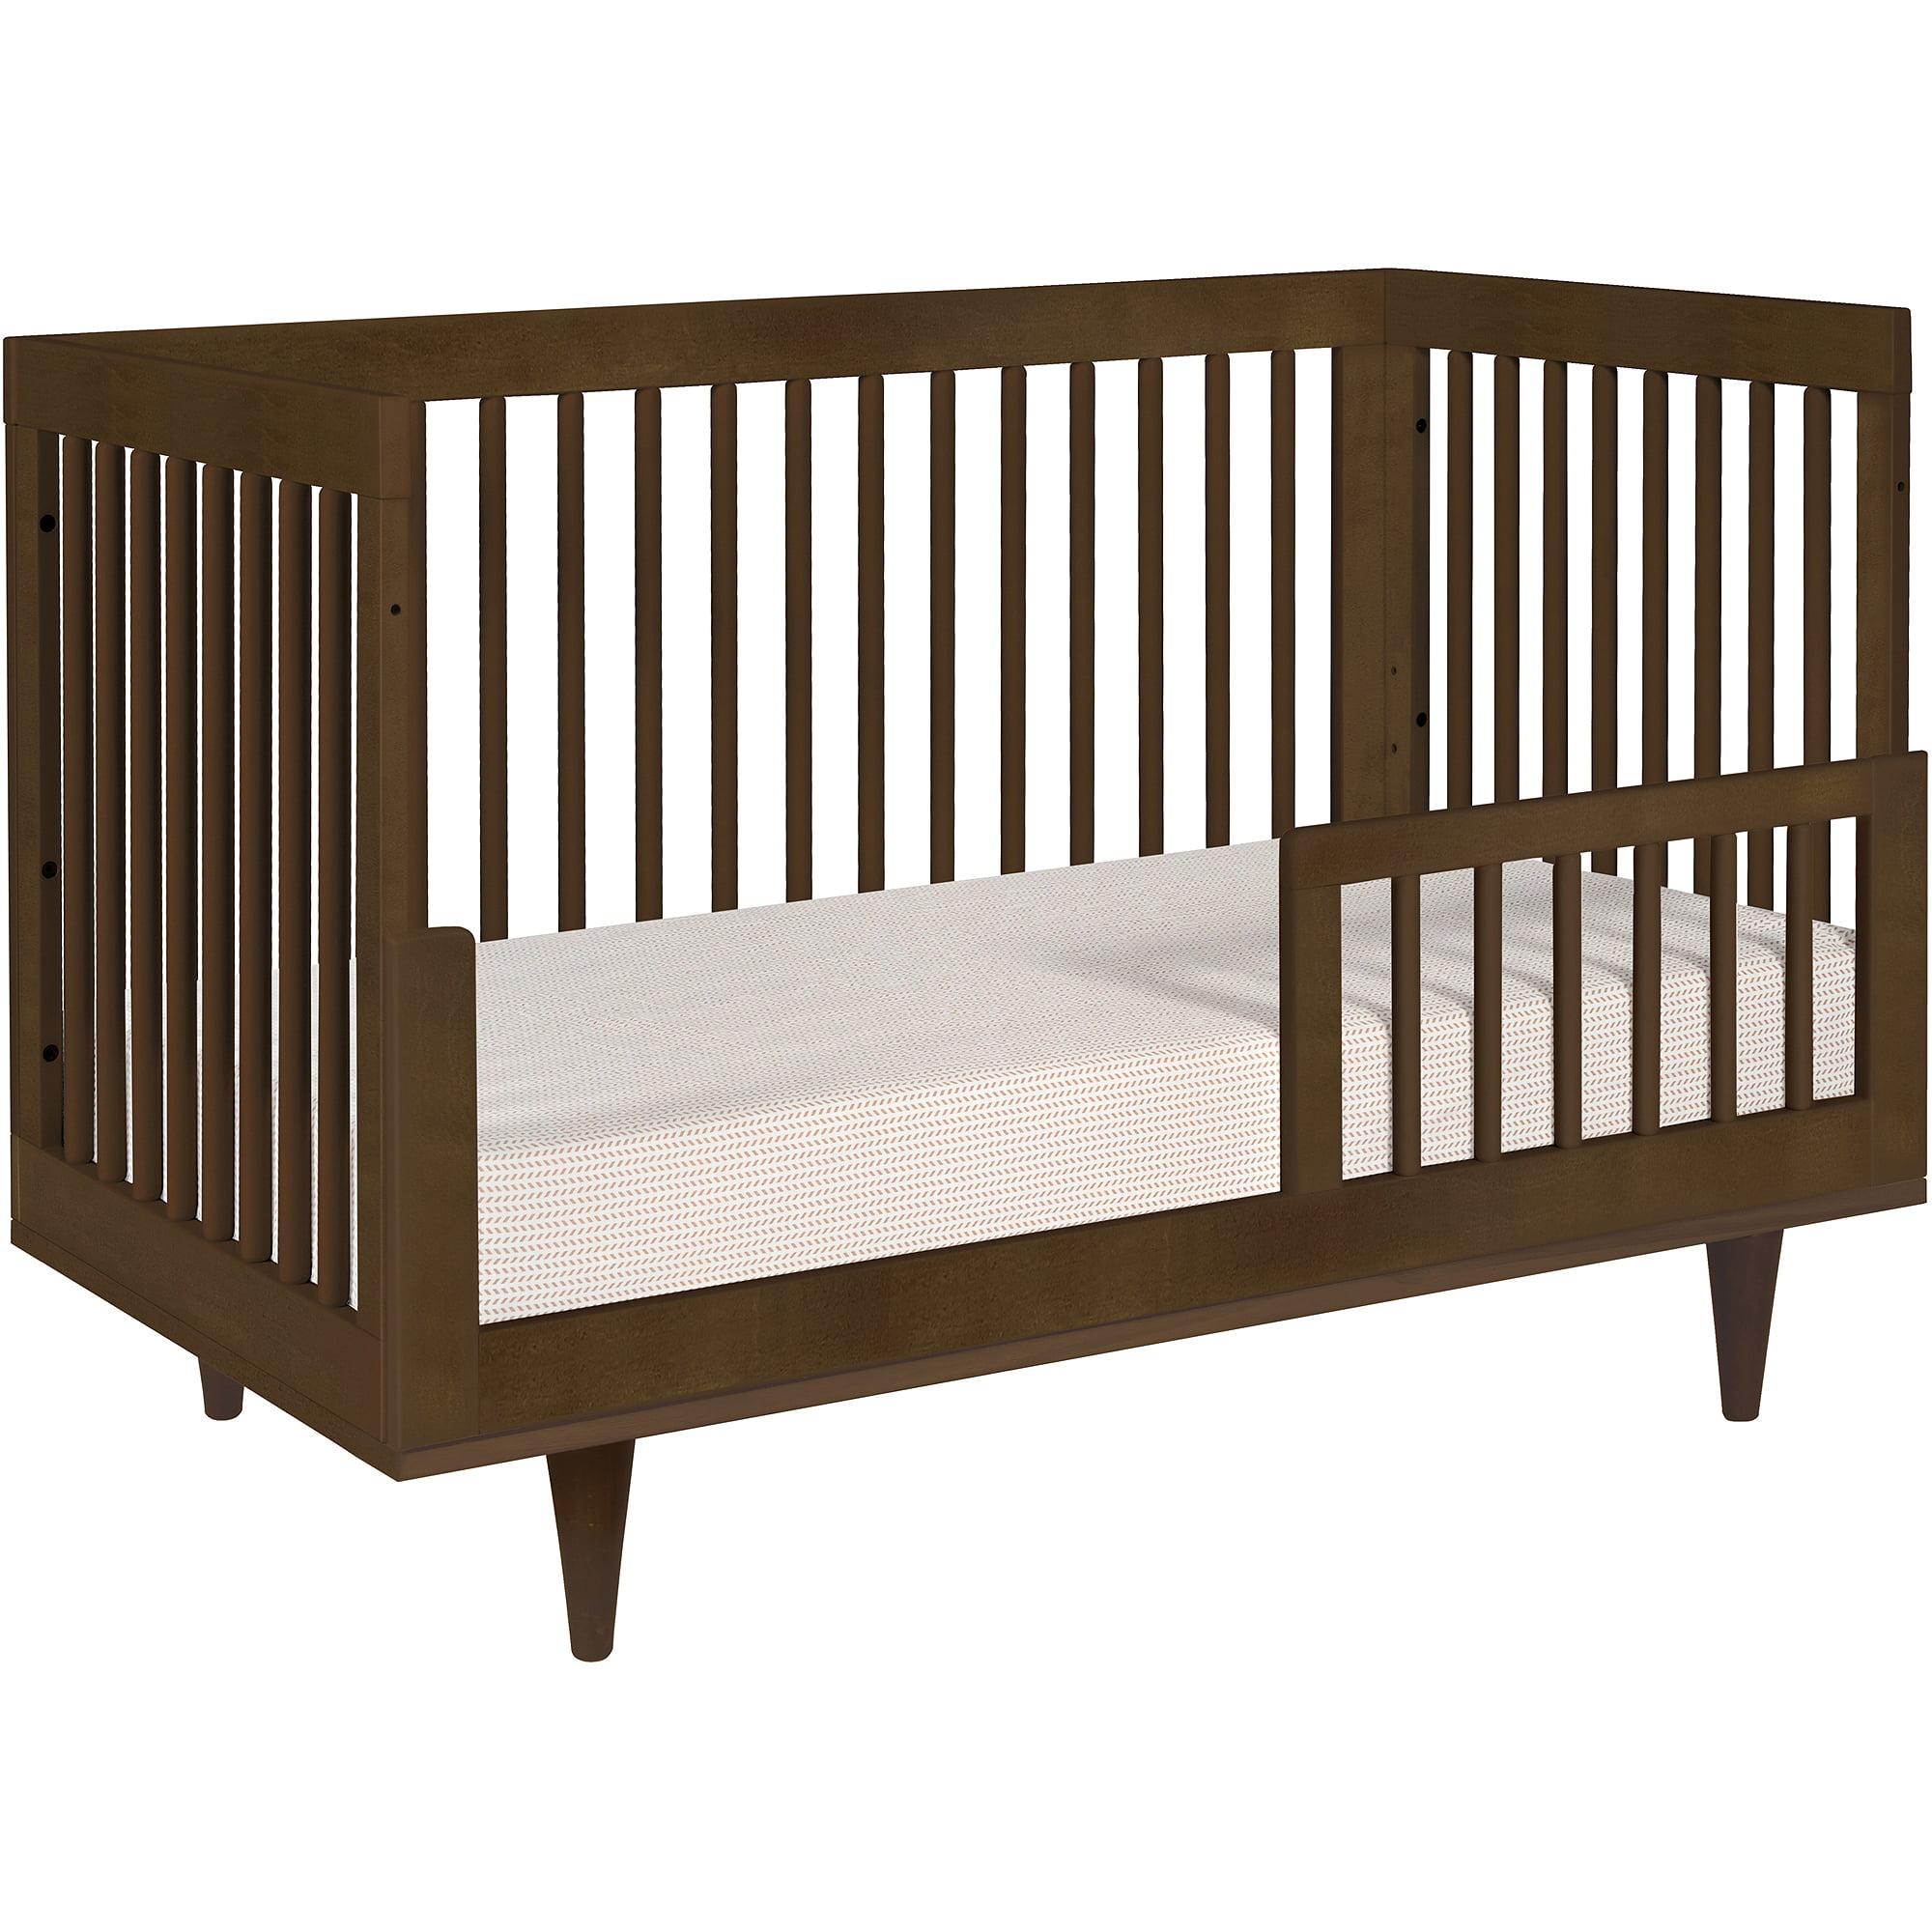 Baby Mod Marley 3 In 1 Convertible Crib Walnut   Walmart.com